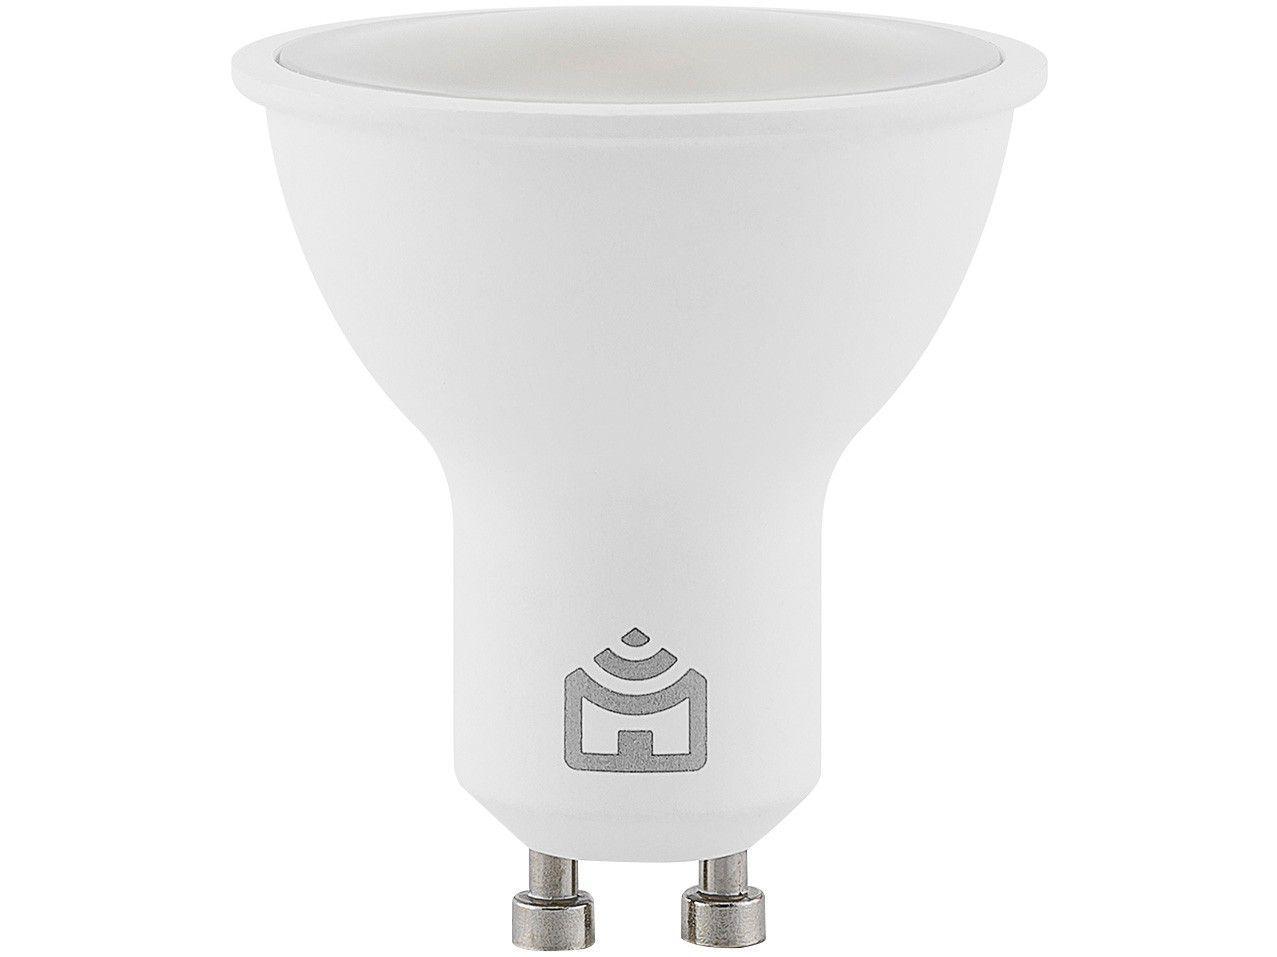 Lâmpada Spot Smart Wi-Fi Positivo - LED 4,5W